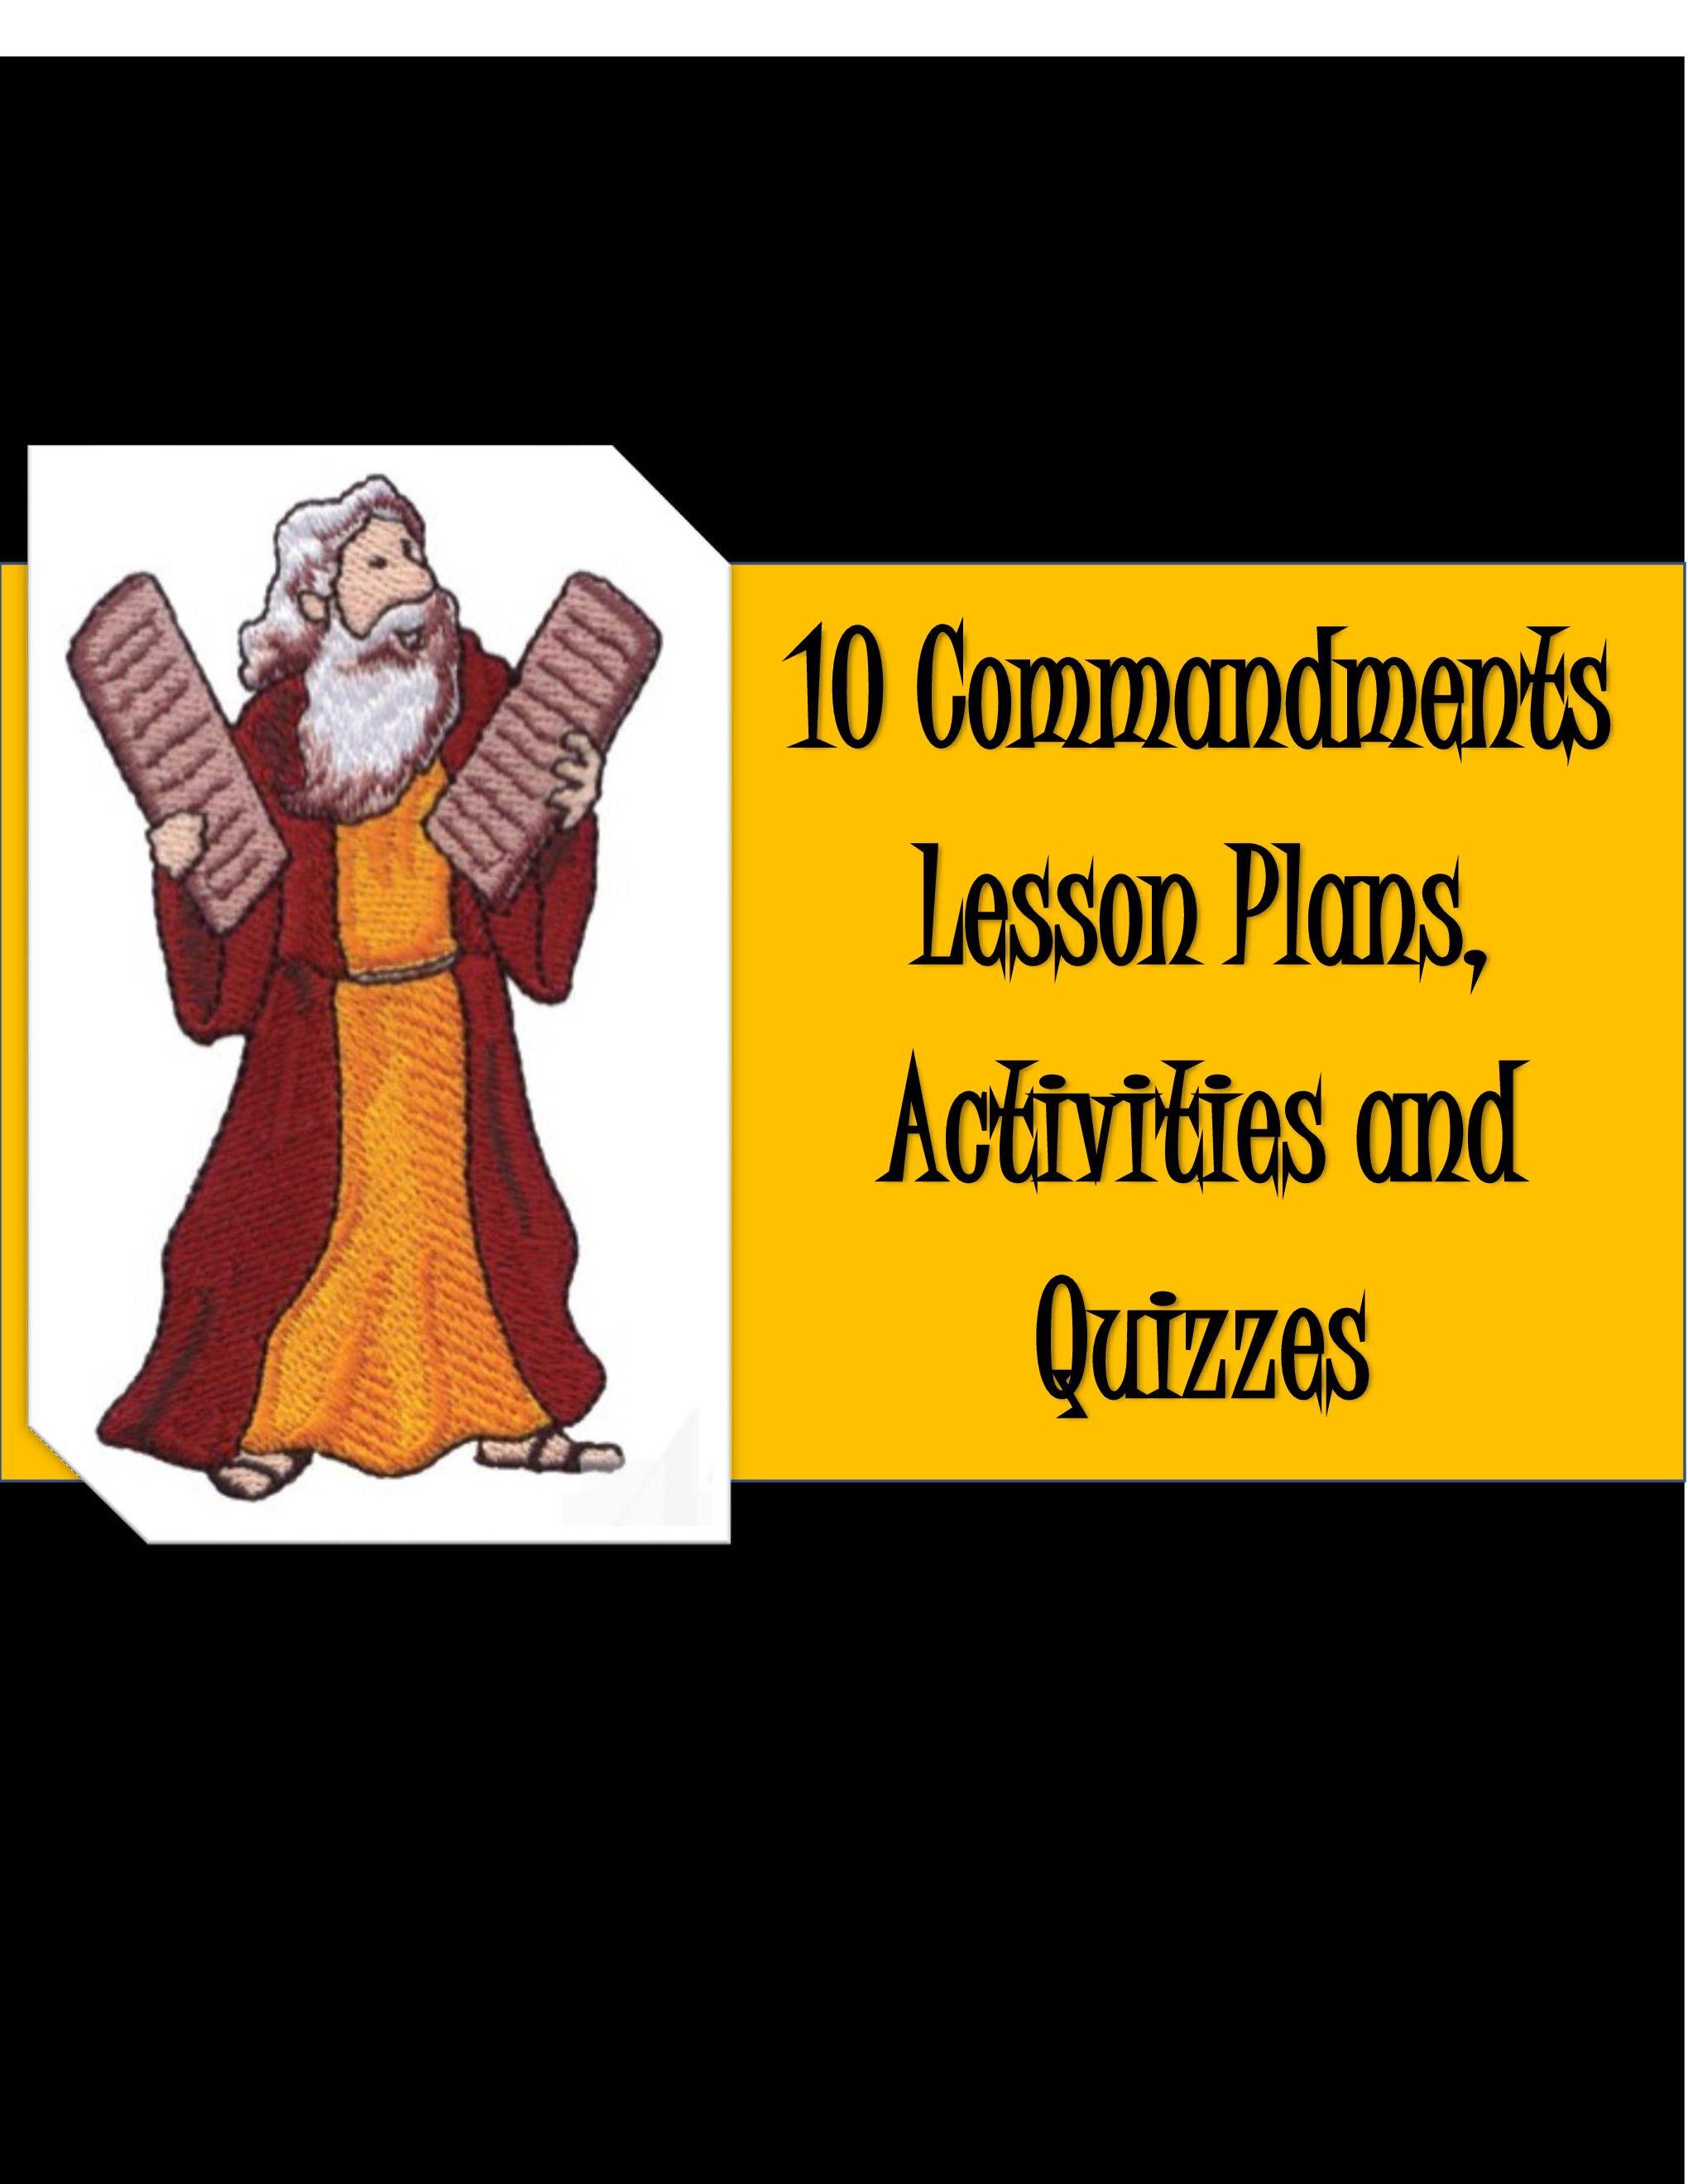 10 Commandments Lesson Activities And Quizzes